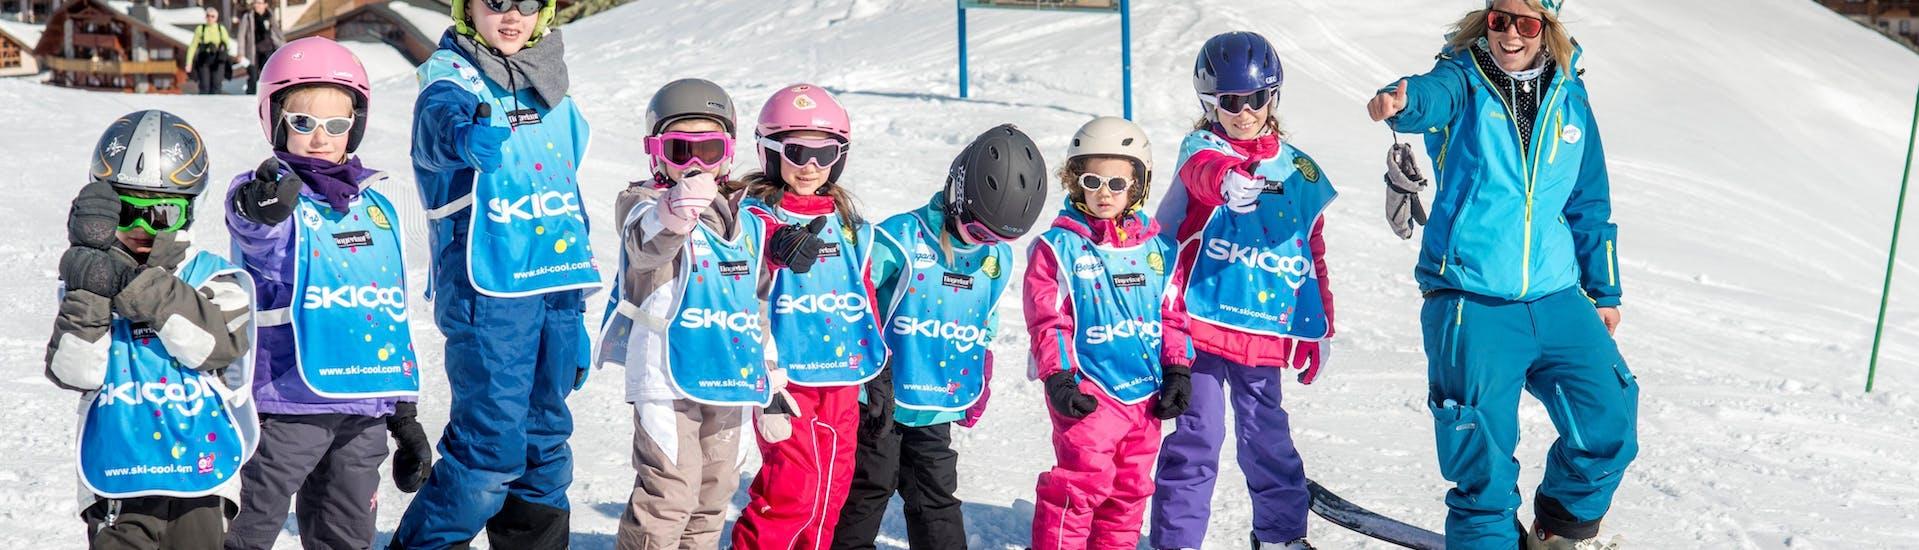 Kids Ski Lessons (5-12 years) - Equipment incl. - Beginners with Ski Cool Val Thorens - Hero image